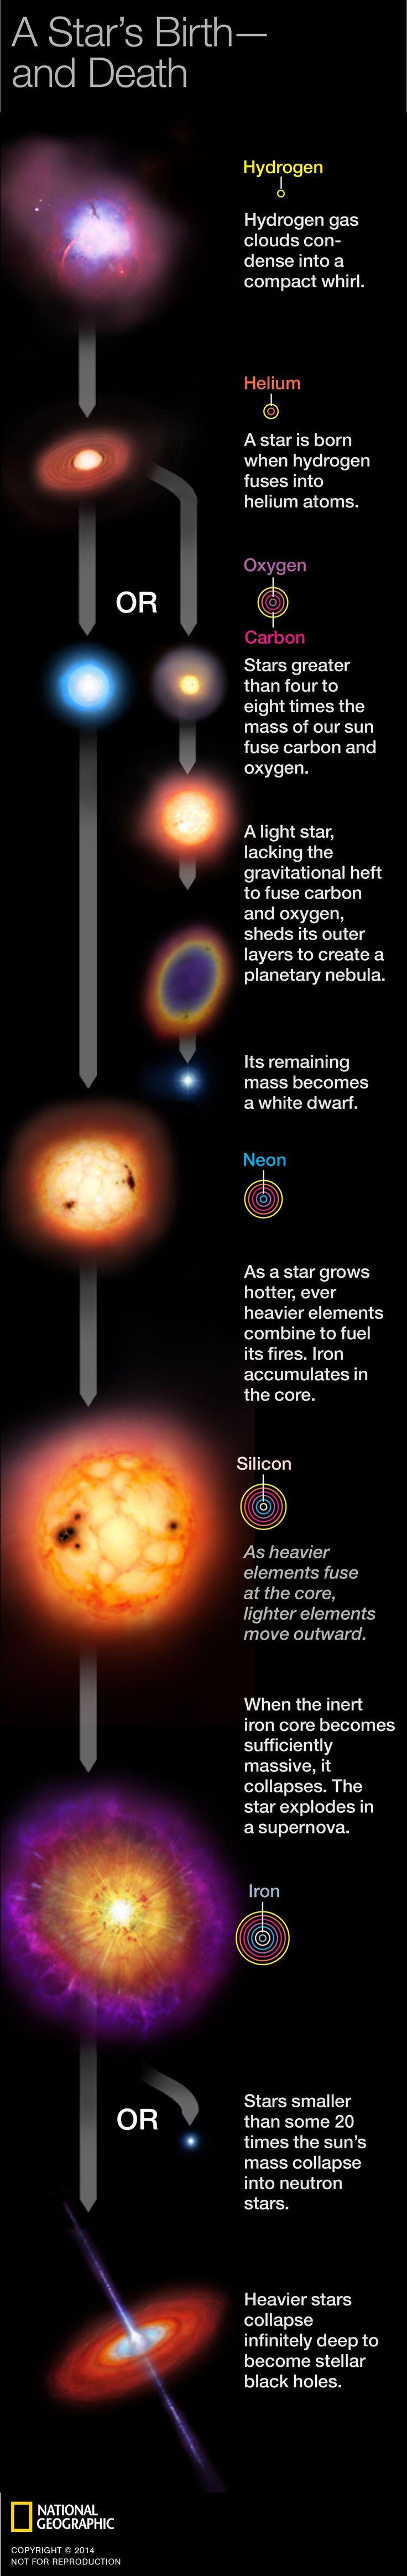 Progression of a star's development. . .